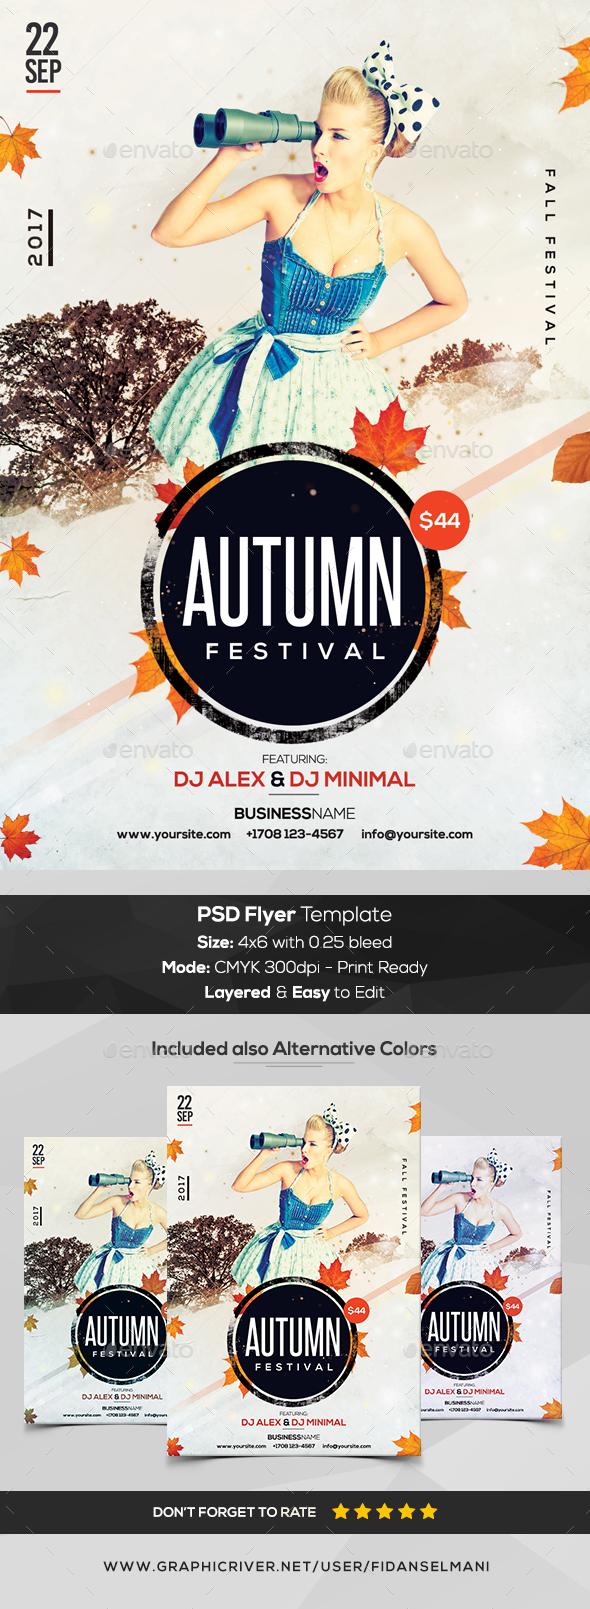 Autumn Festival - PSD Flyer Template - Flyers Print Templates